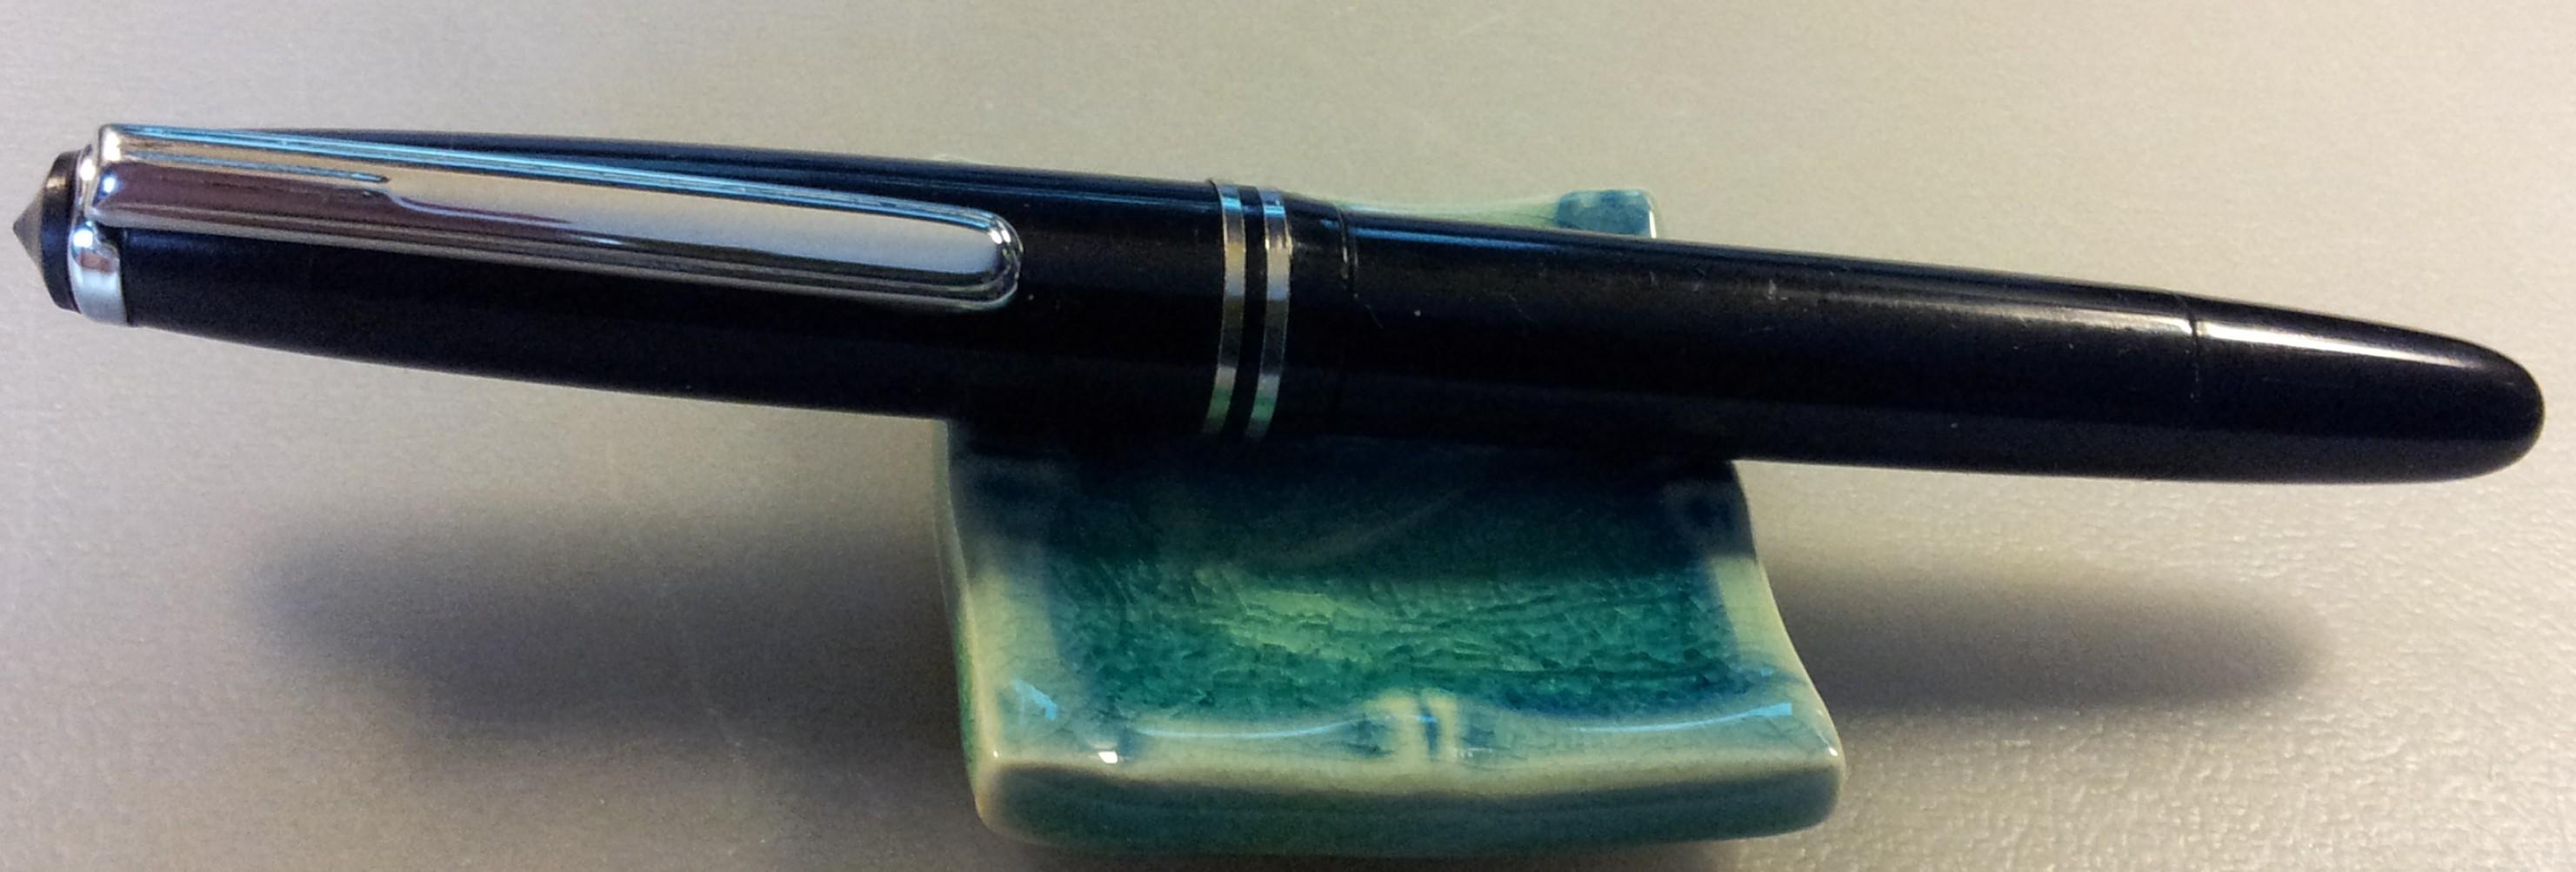 guru pen from fountain pen revolution inlovewithjournals